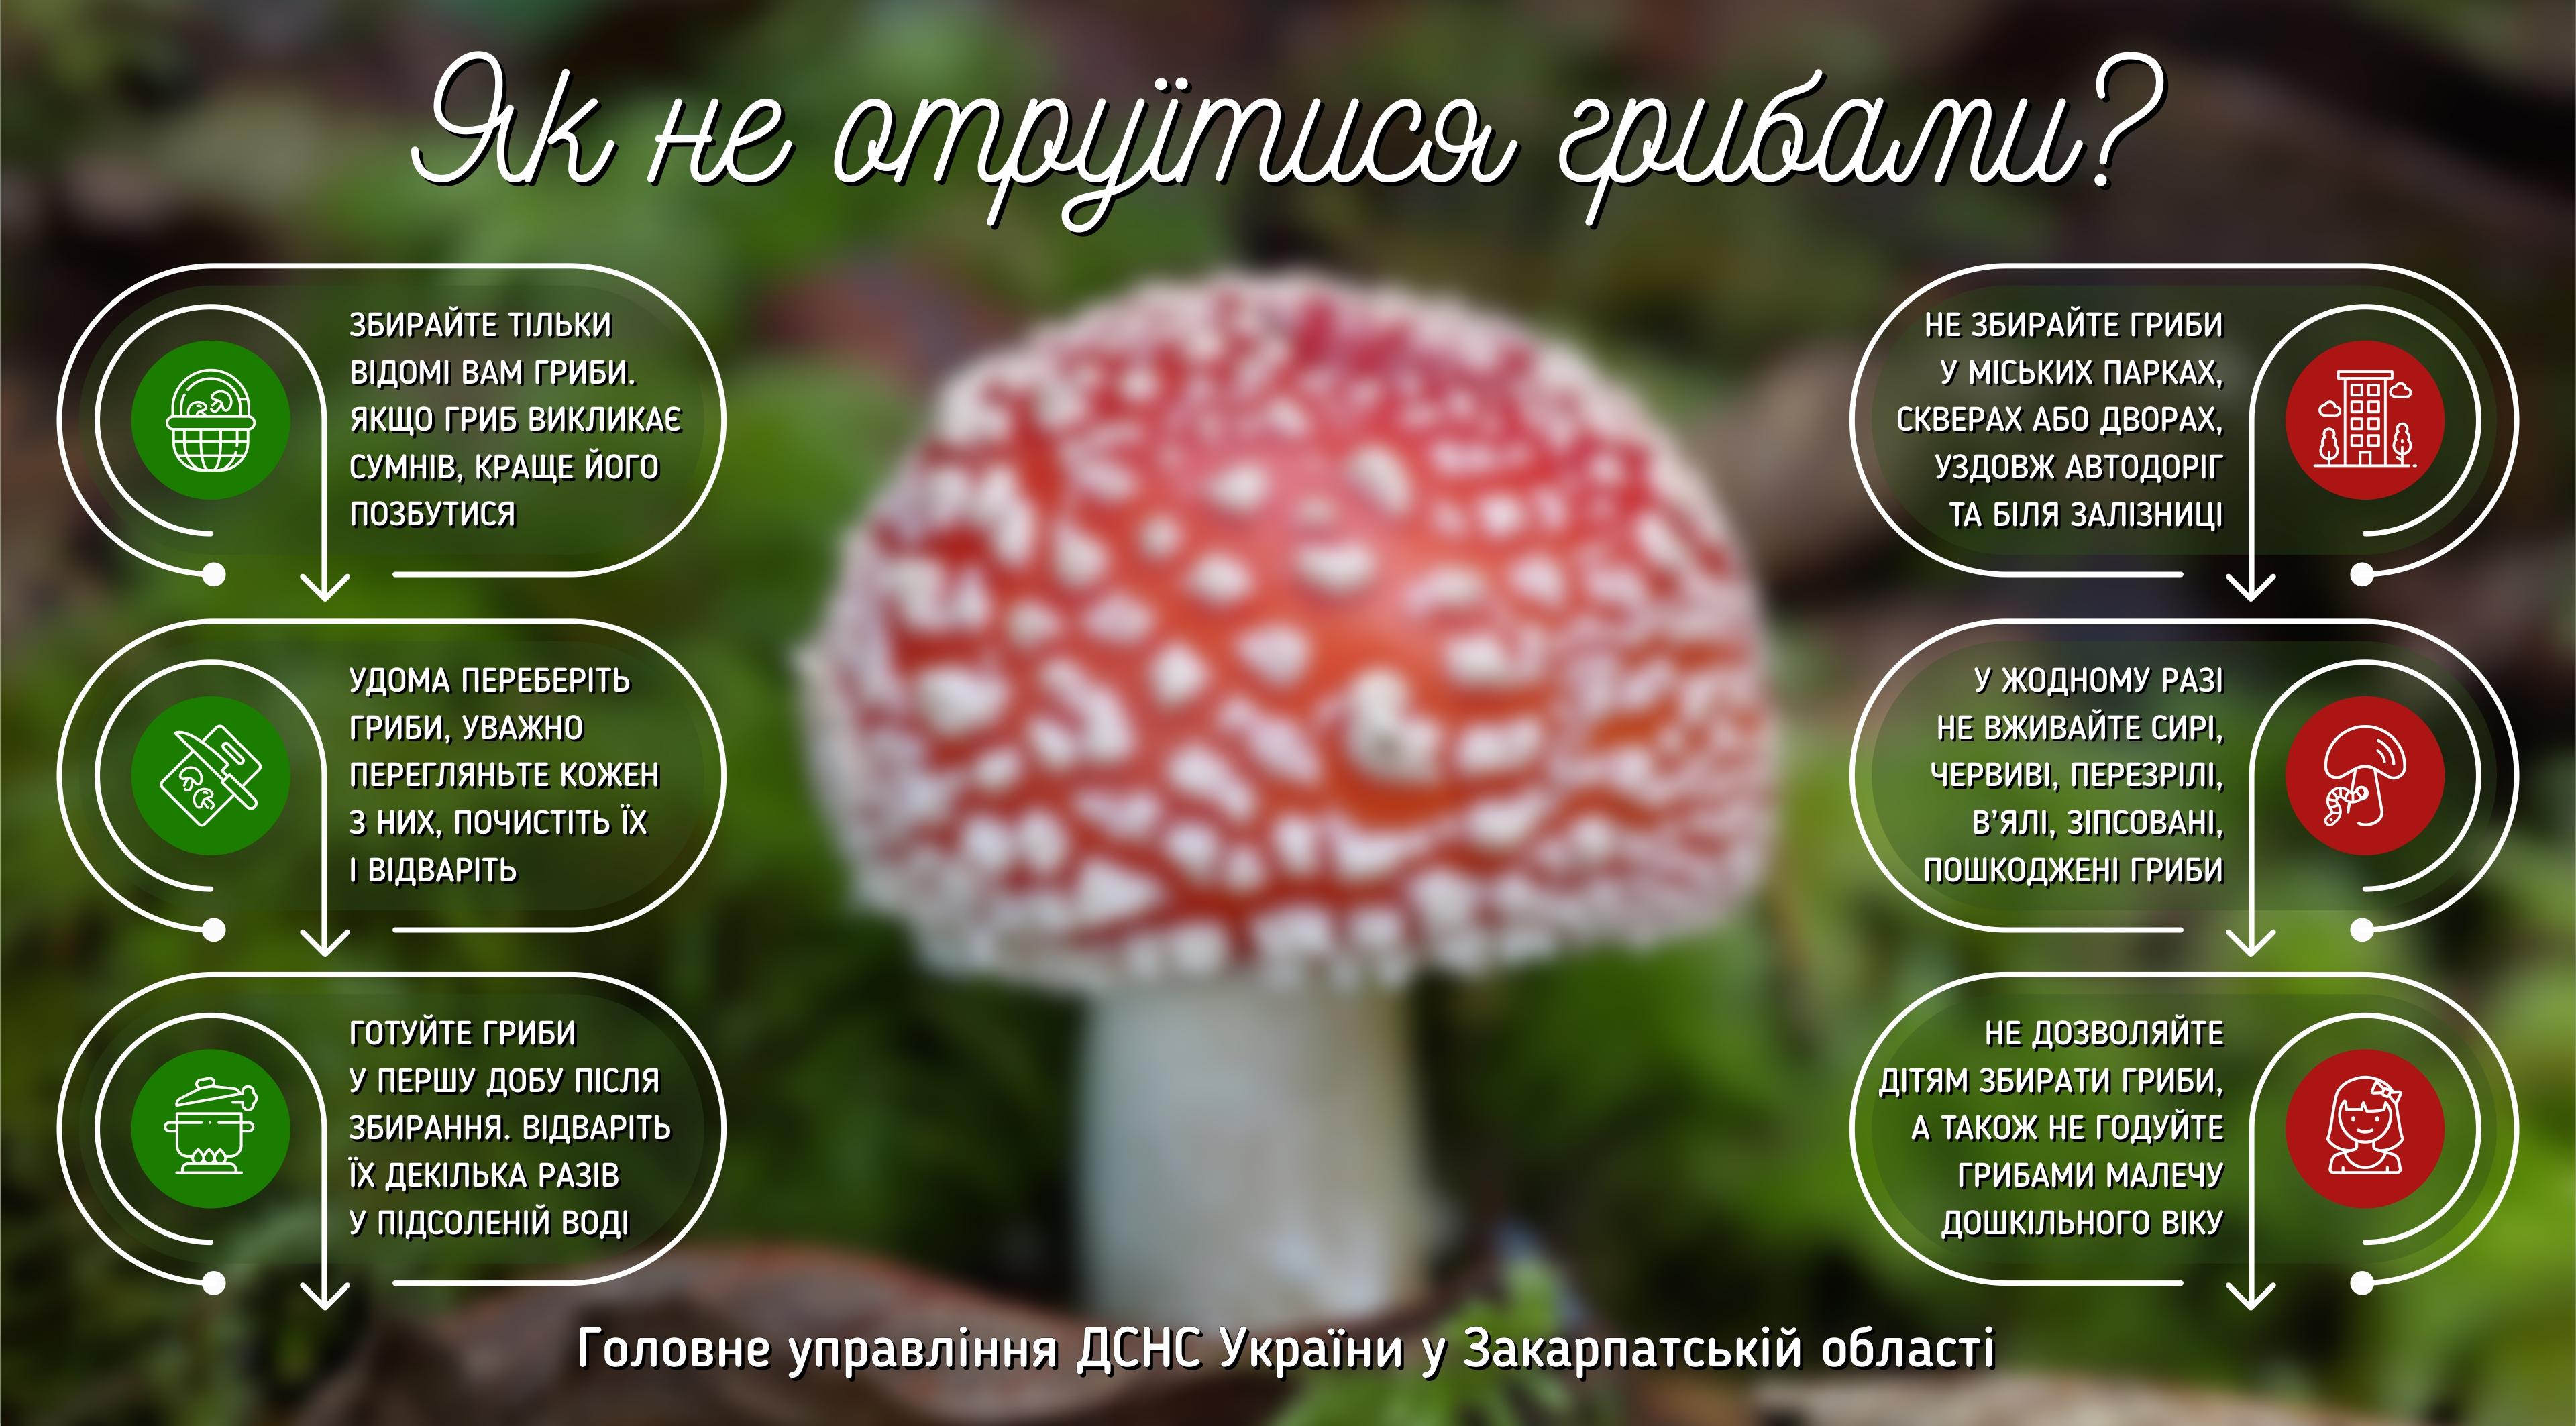 hriby_gu.jpg